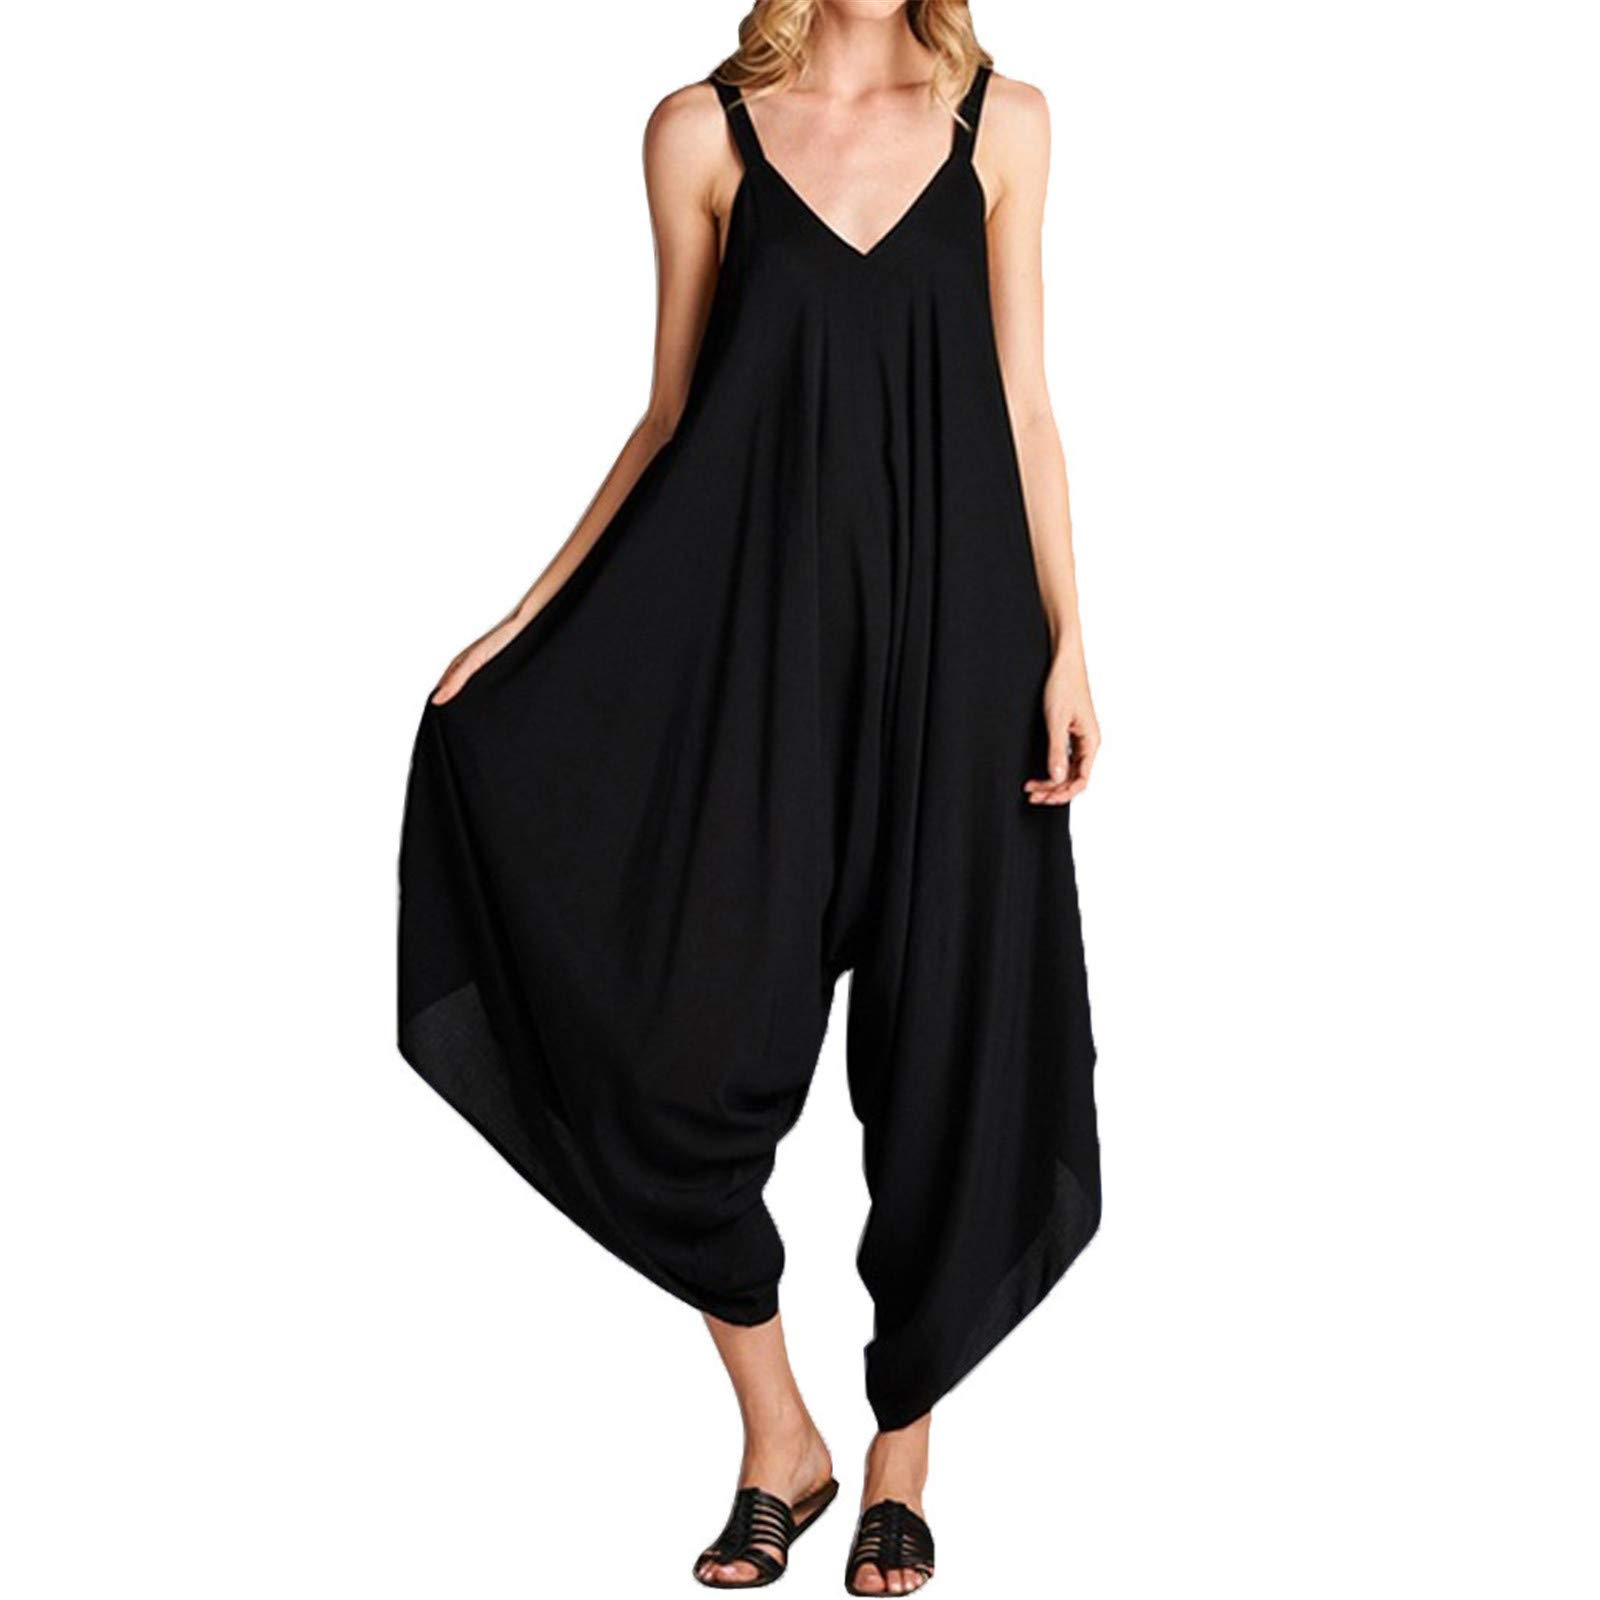 Thenxin Loose Romper for Women Sling V-Neck Wide Leg Jumpsuit Solid Color Comfy Outfit Playsuit (Black,XL)